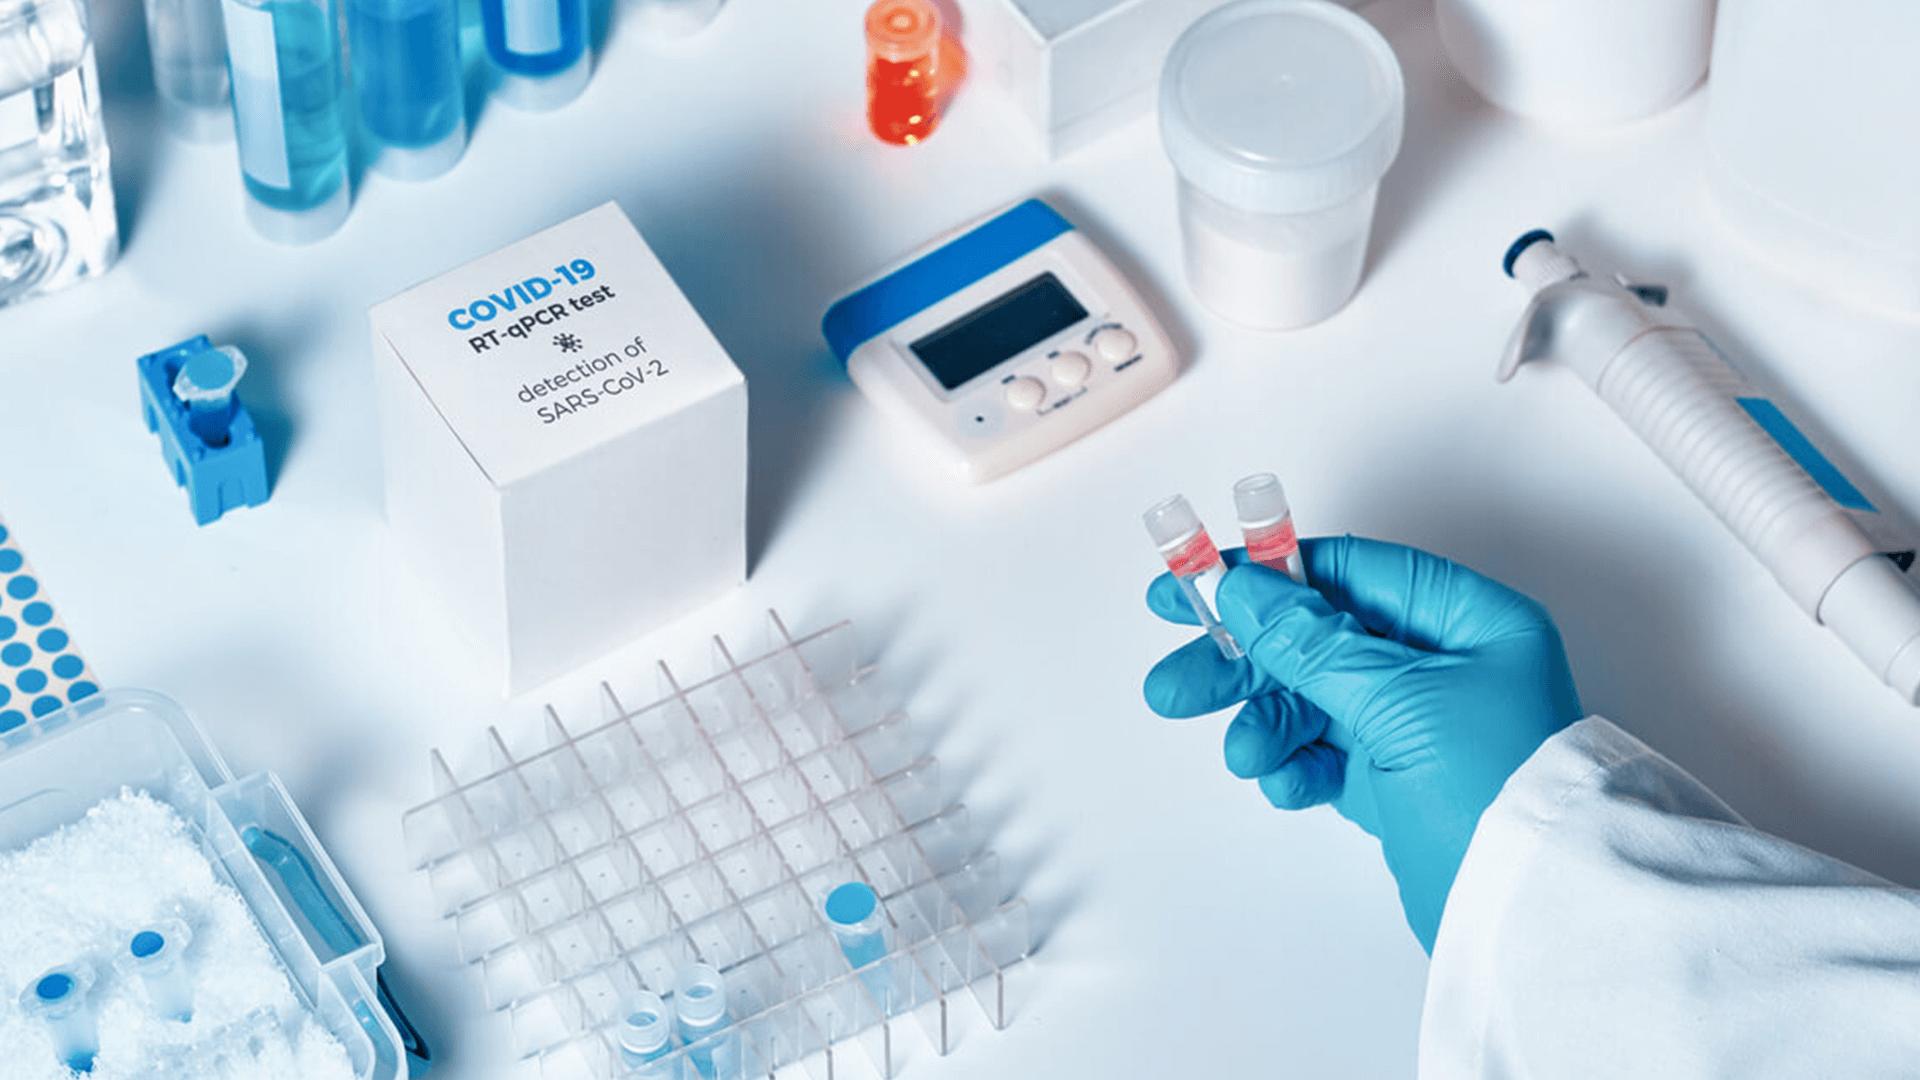 COVID-19 saliva testing kit